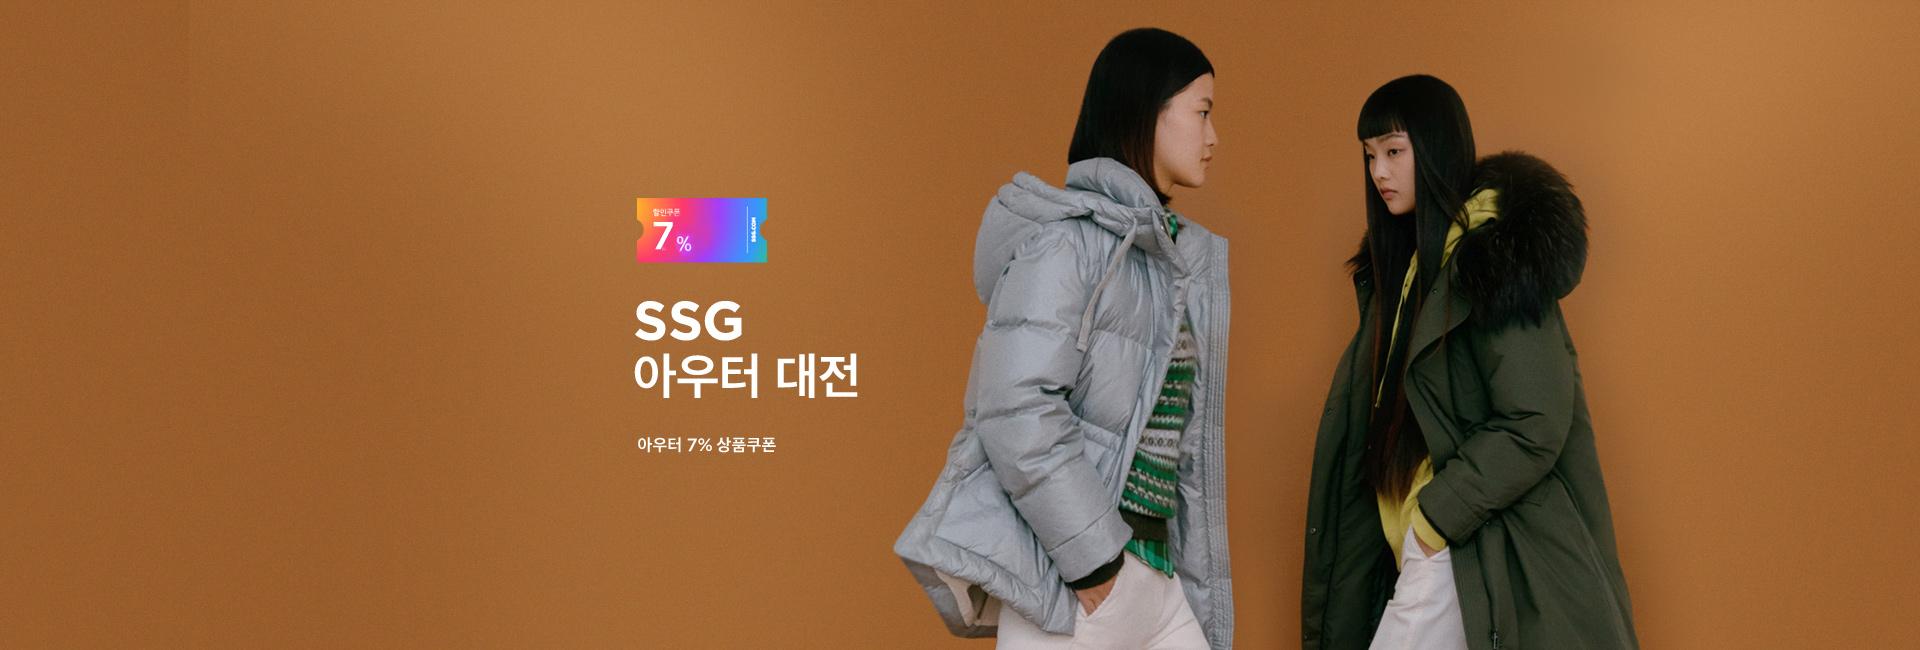 SSG아우터 대전